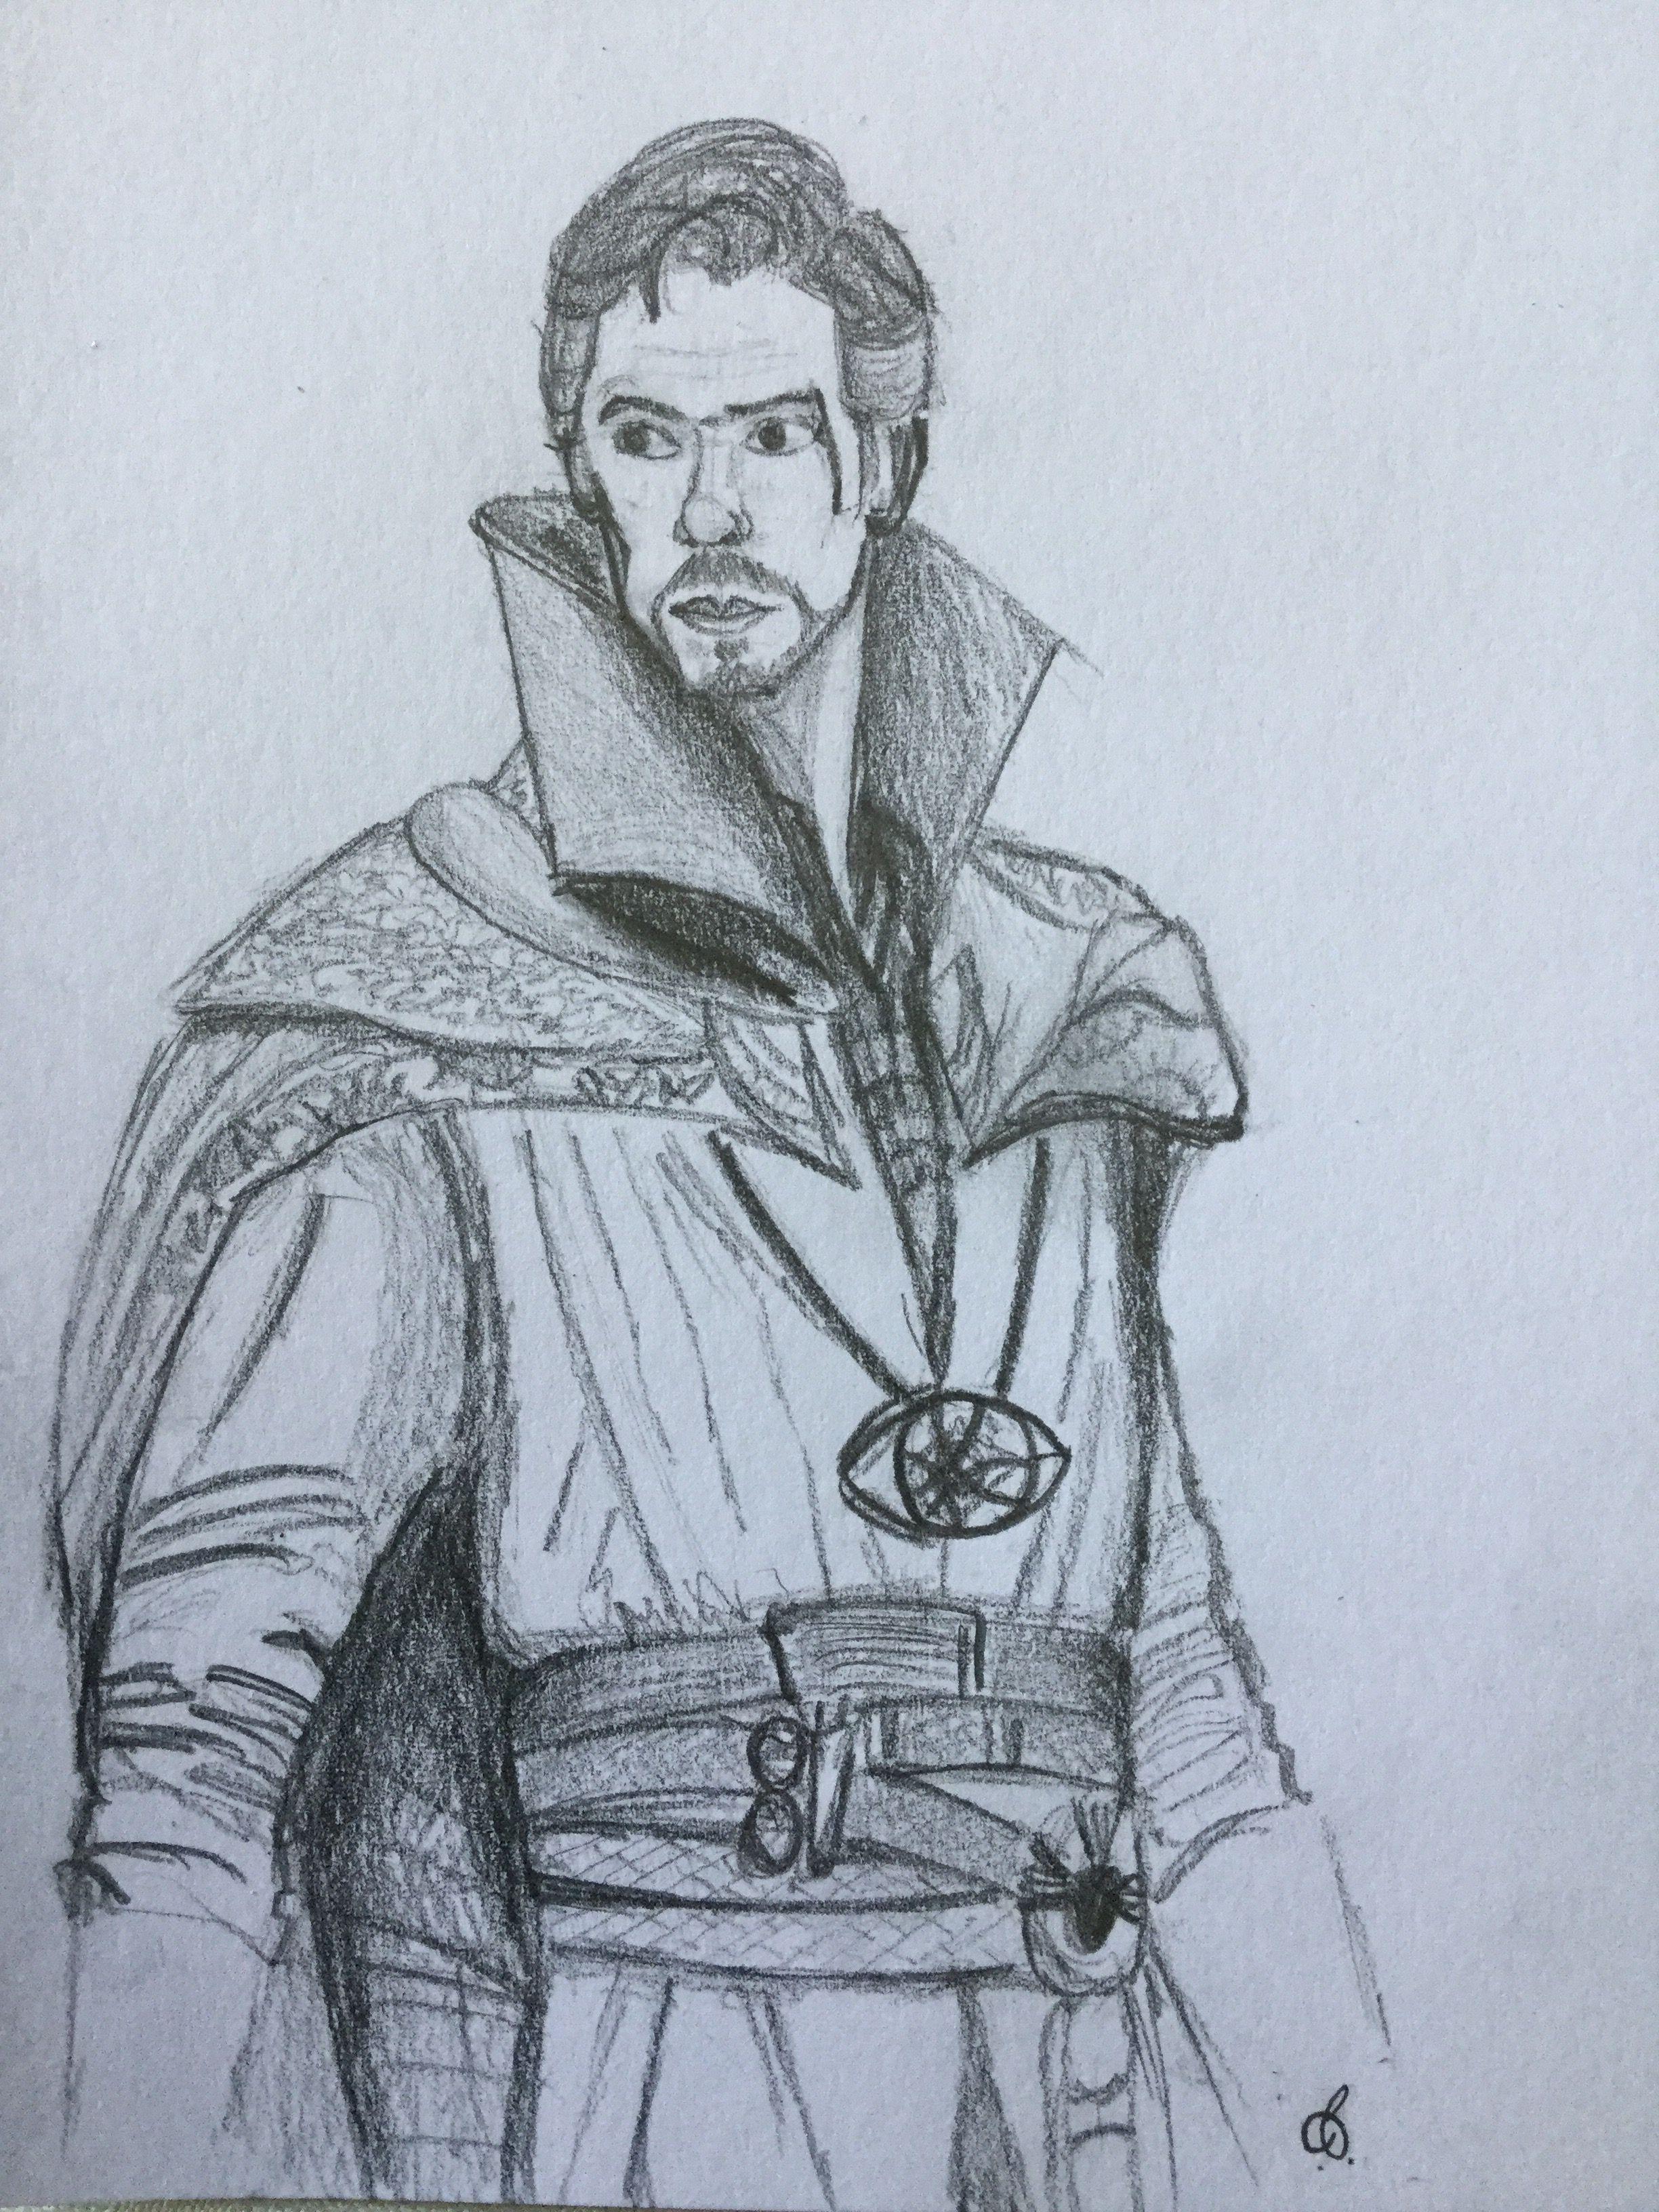 Strange pencil drawings pencil sketch